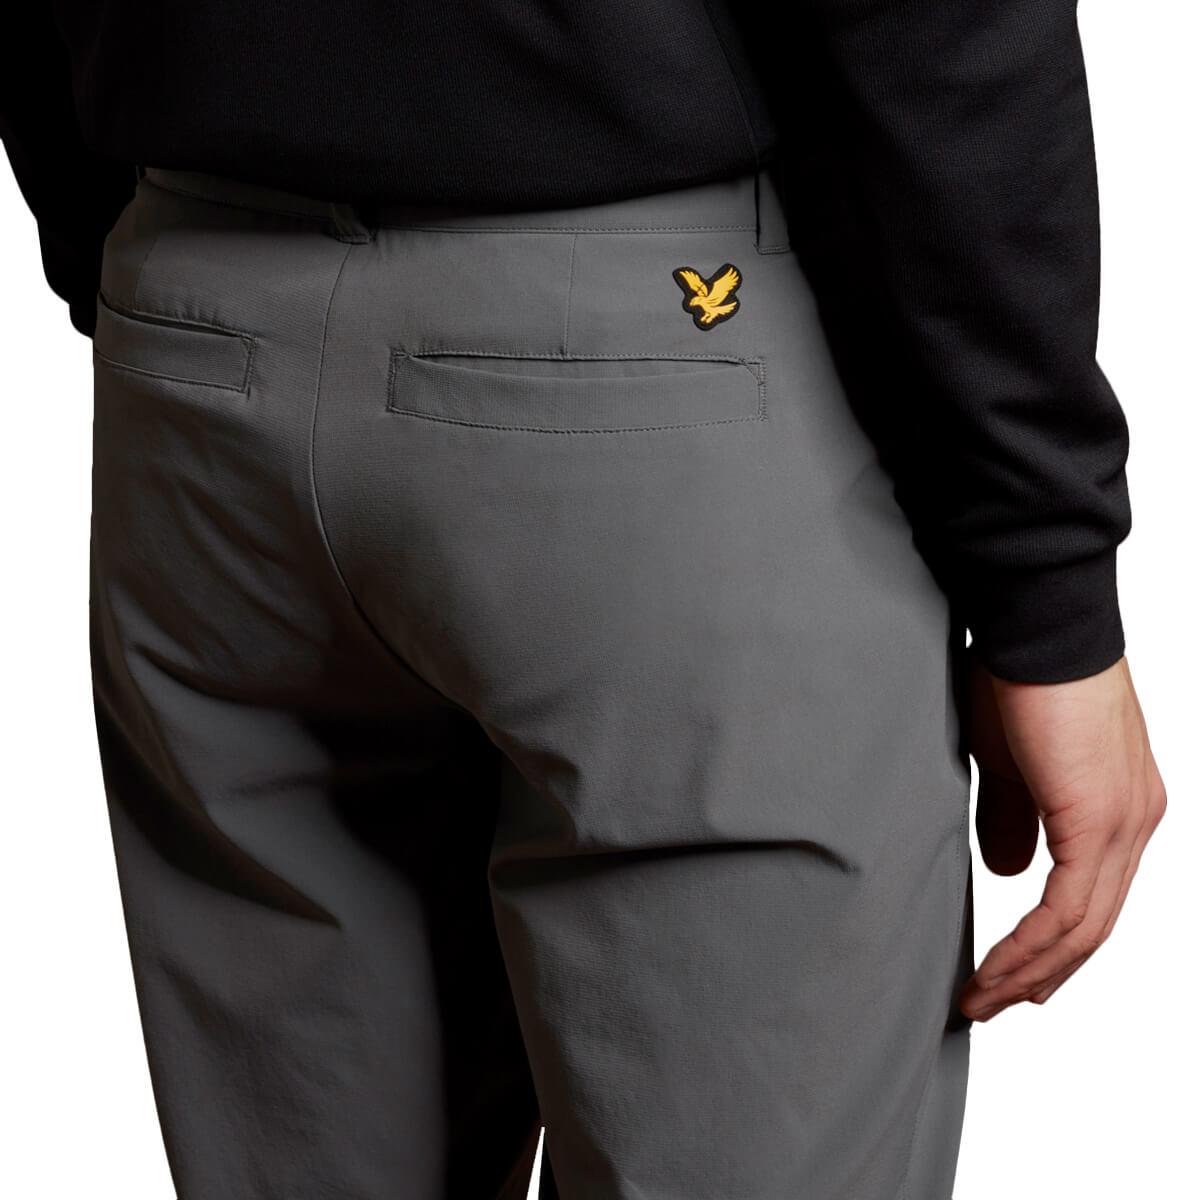 thumbnail 9 - Lyle & Scott Mens Golf Tech Light Stretch Breathable Trousers 55% OFF RRP